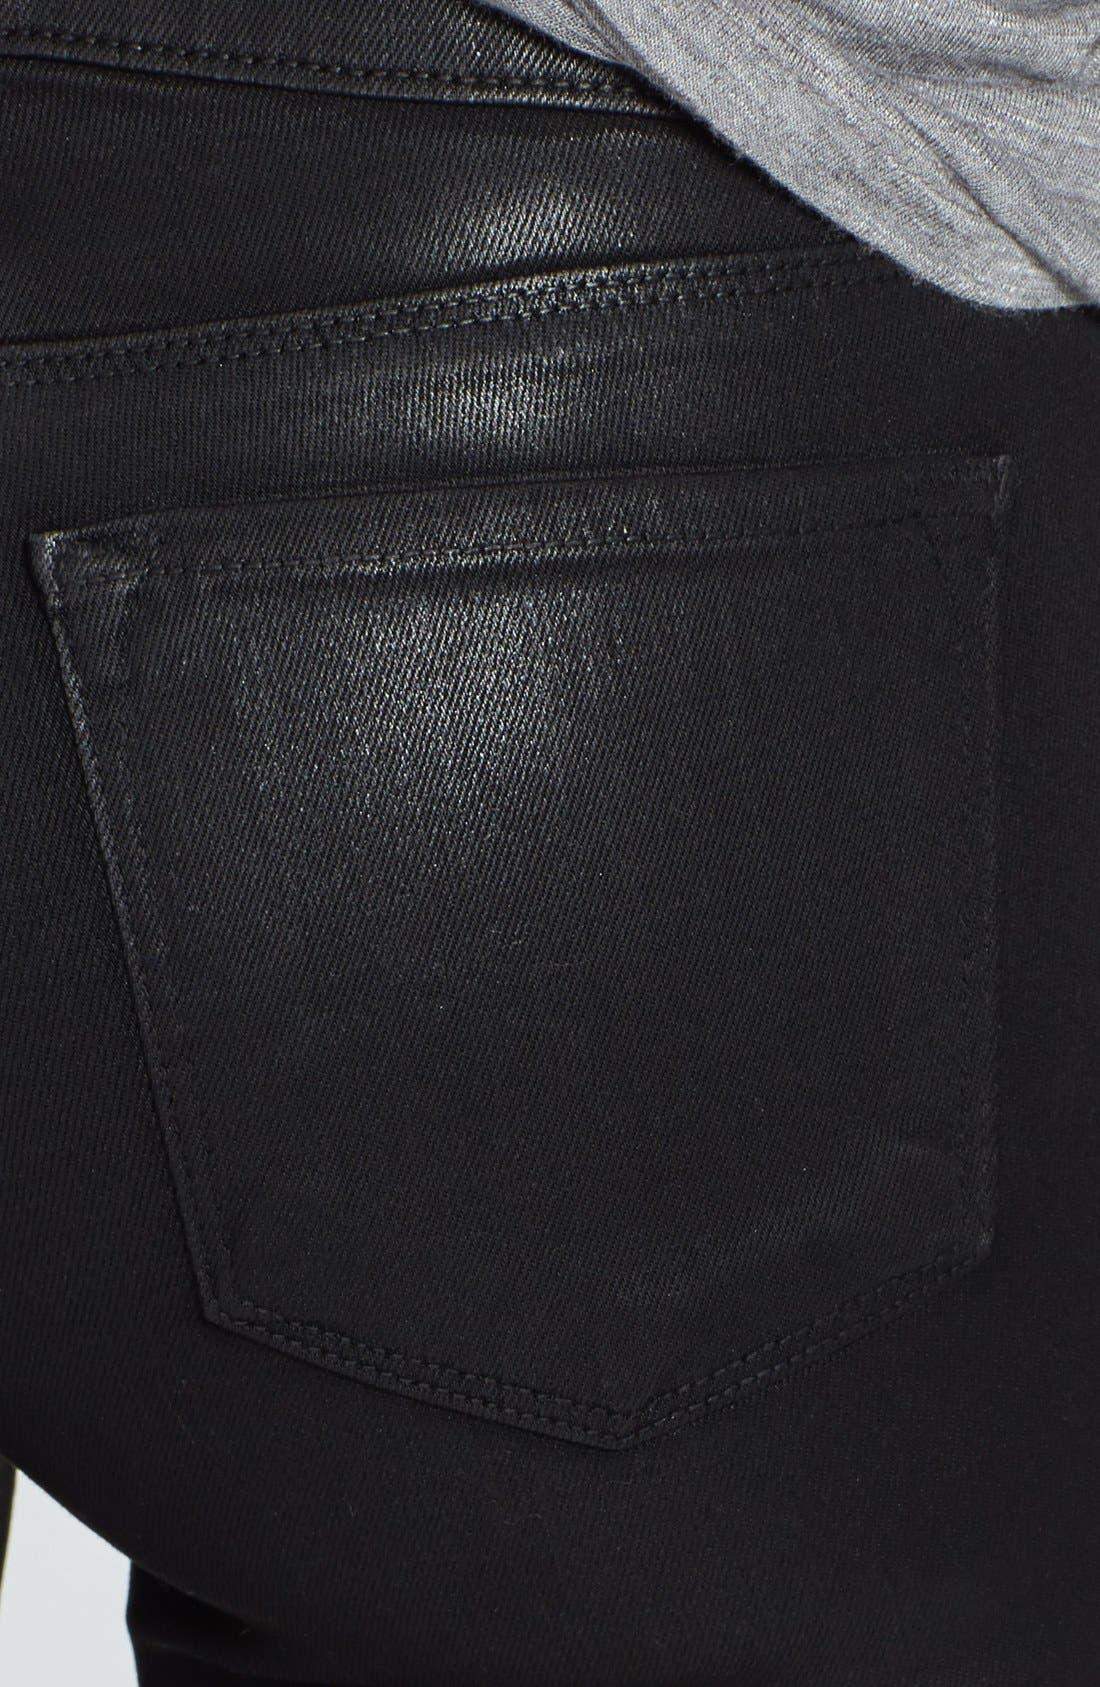 Alternate Image 3  - J Brand '1446 Carey' Moto Skinny Crop Pants (Lacquered Black)